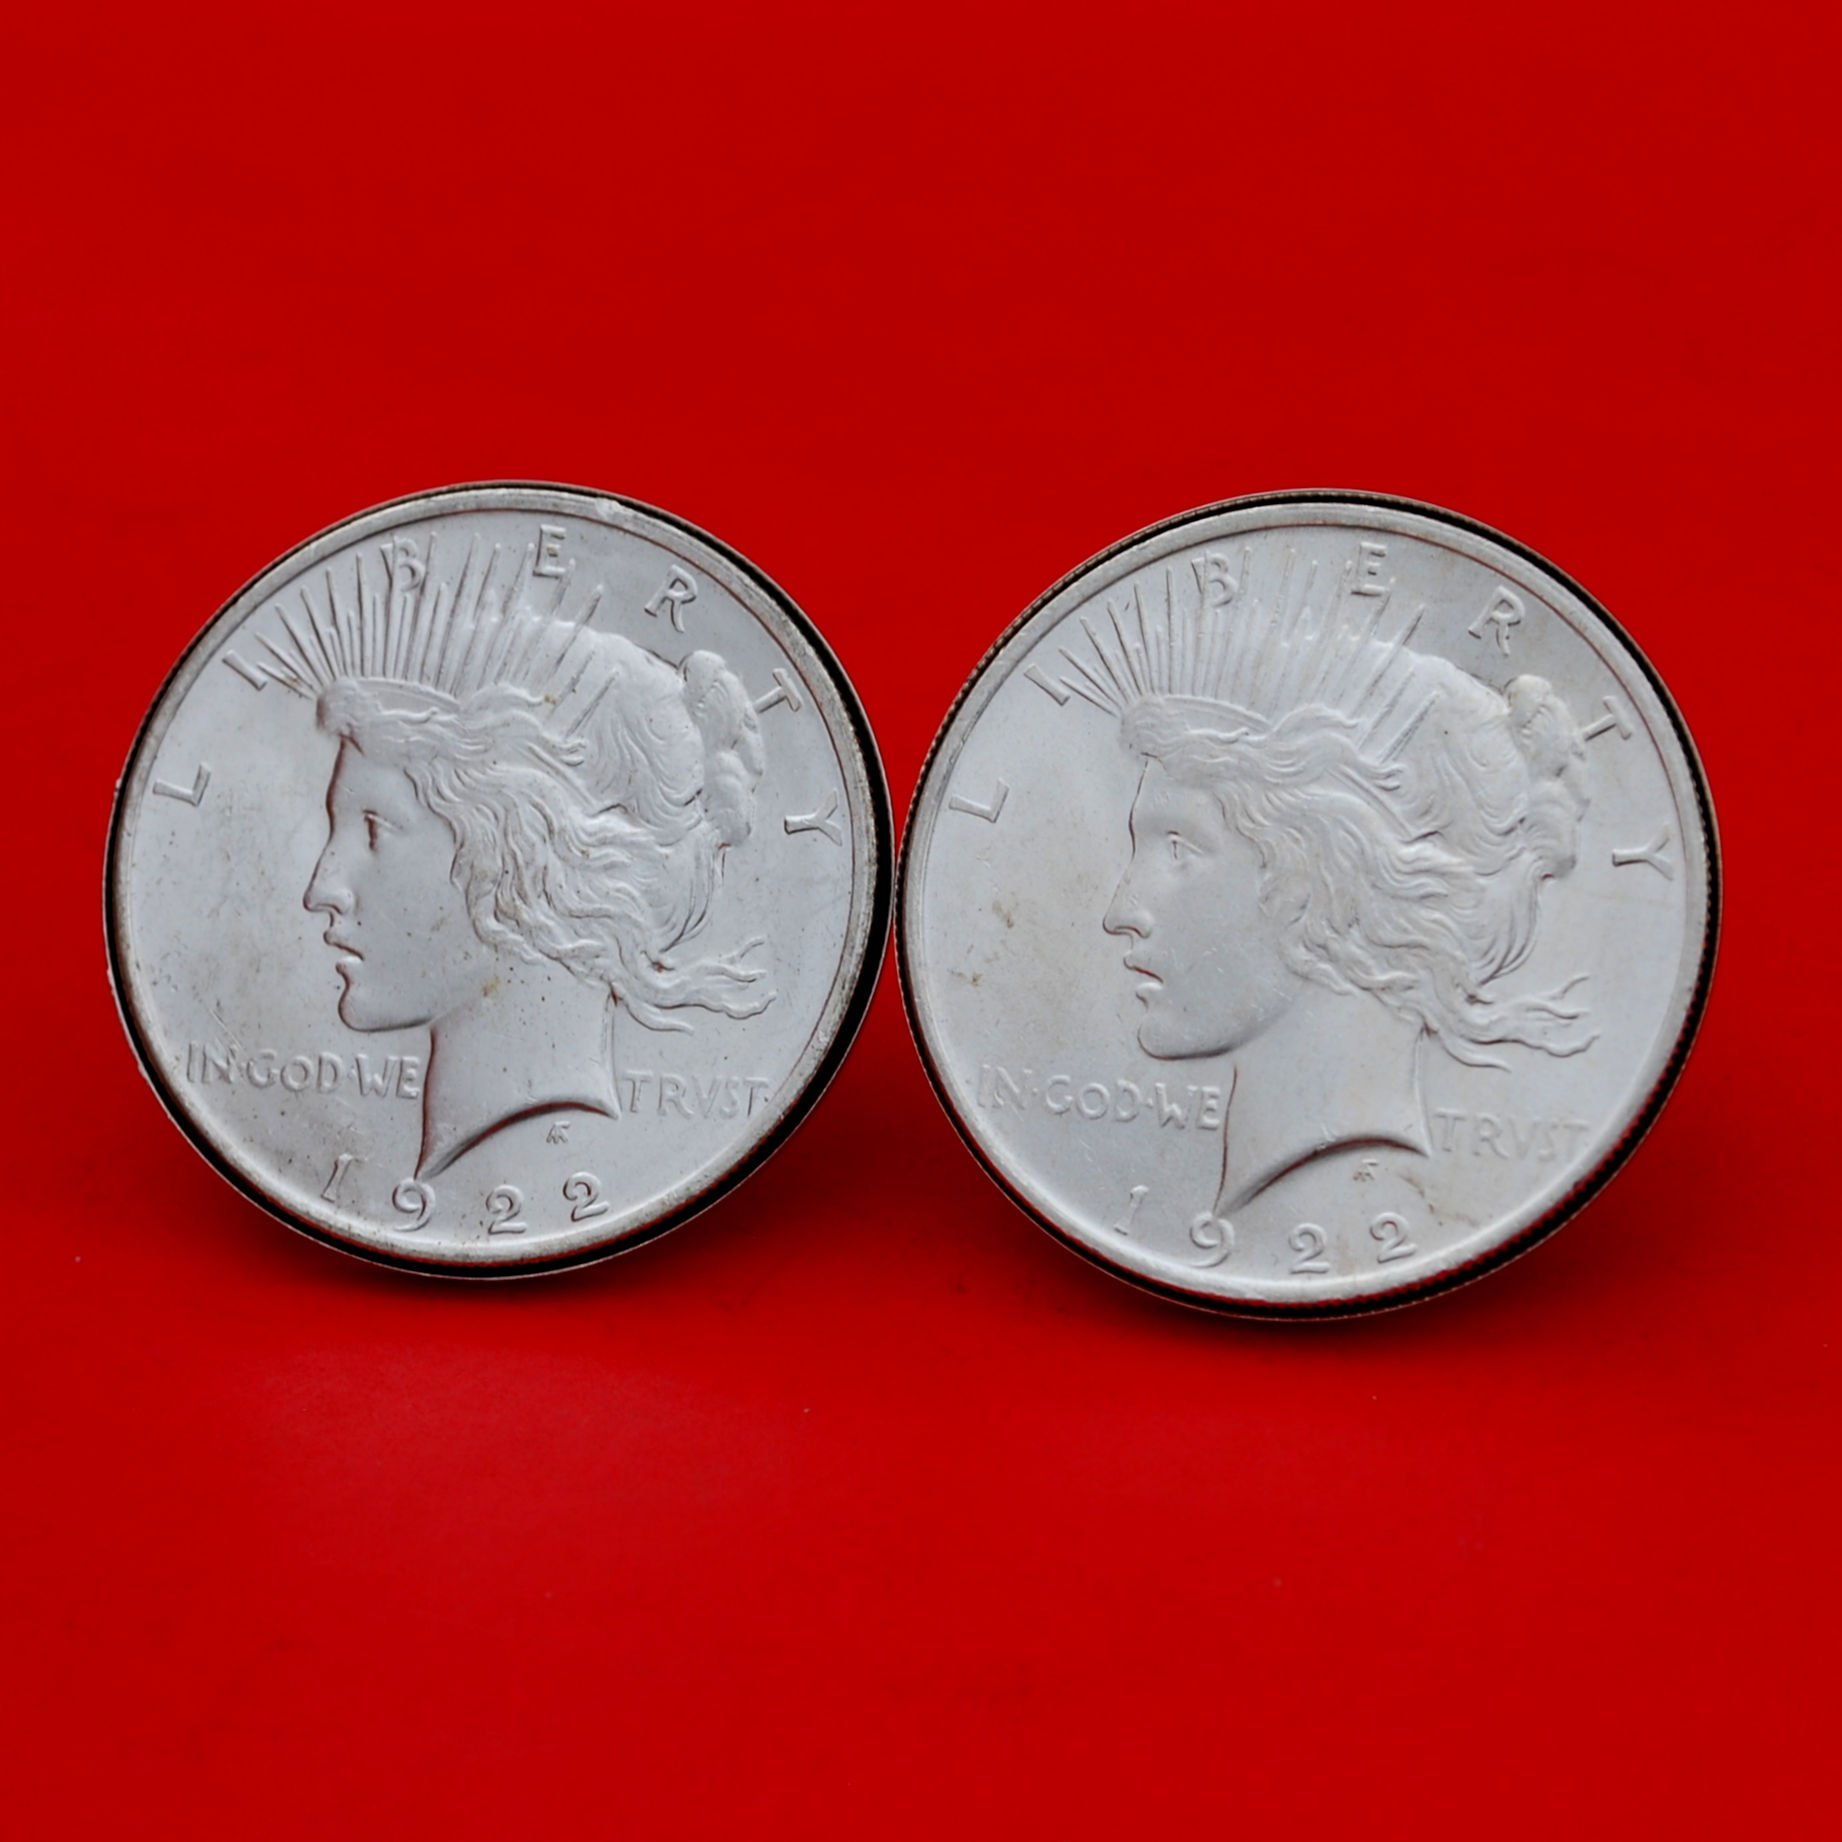 US 1922 Peace Silver Dollar BU Uncirculated Coins Silver Cufflinks NEW